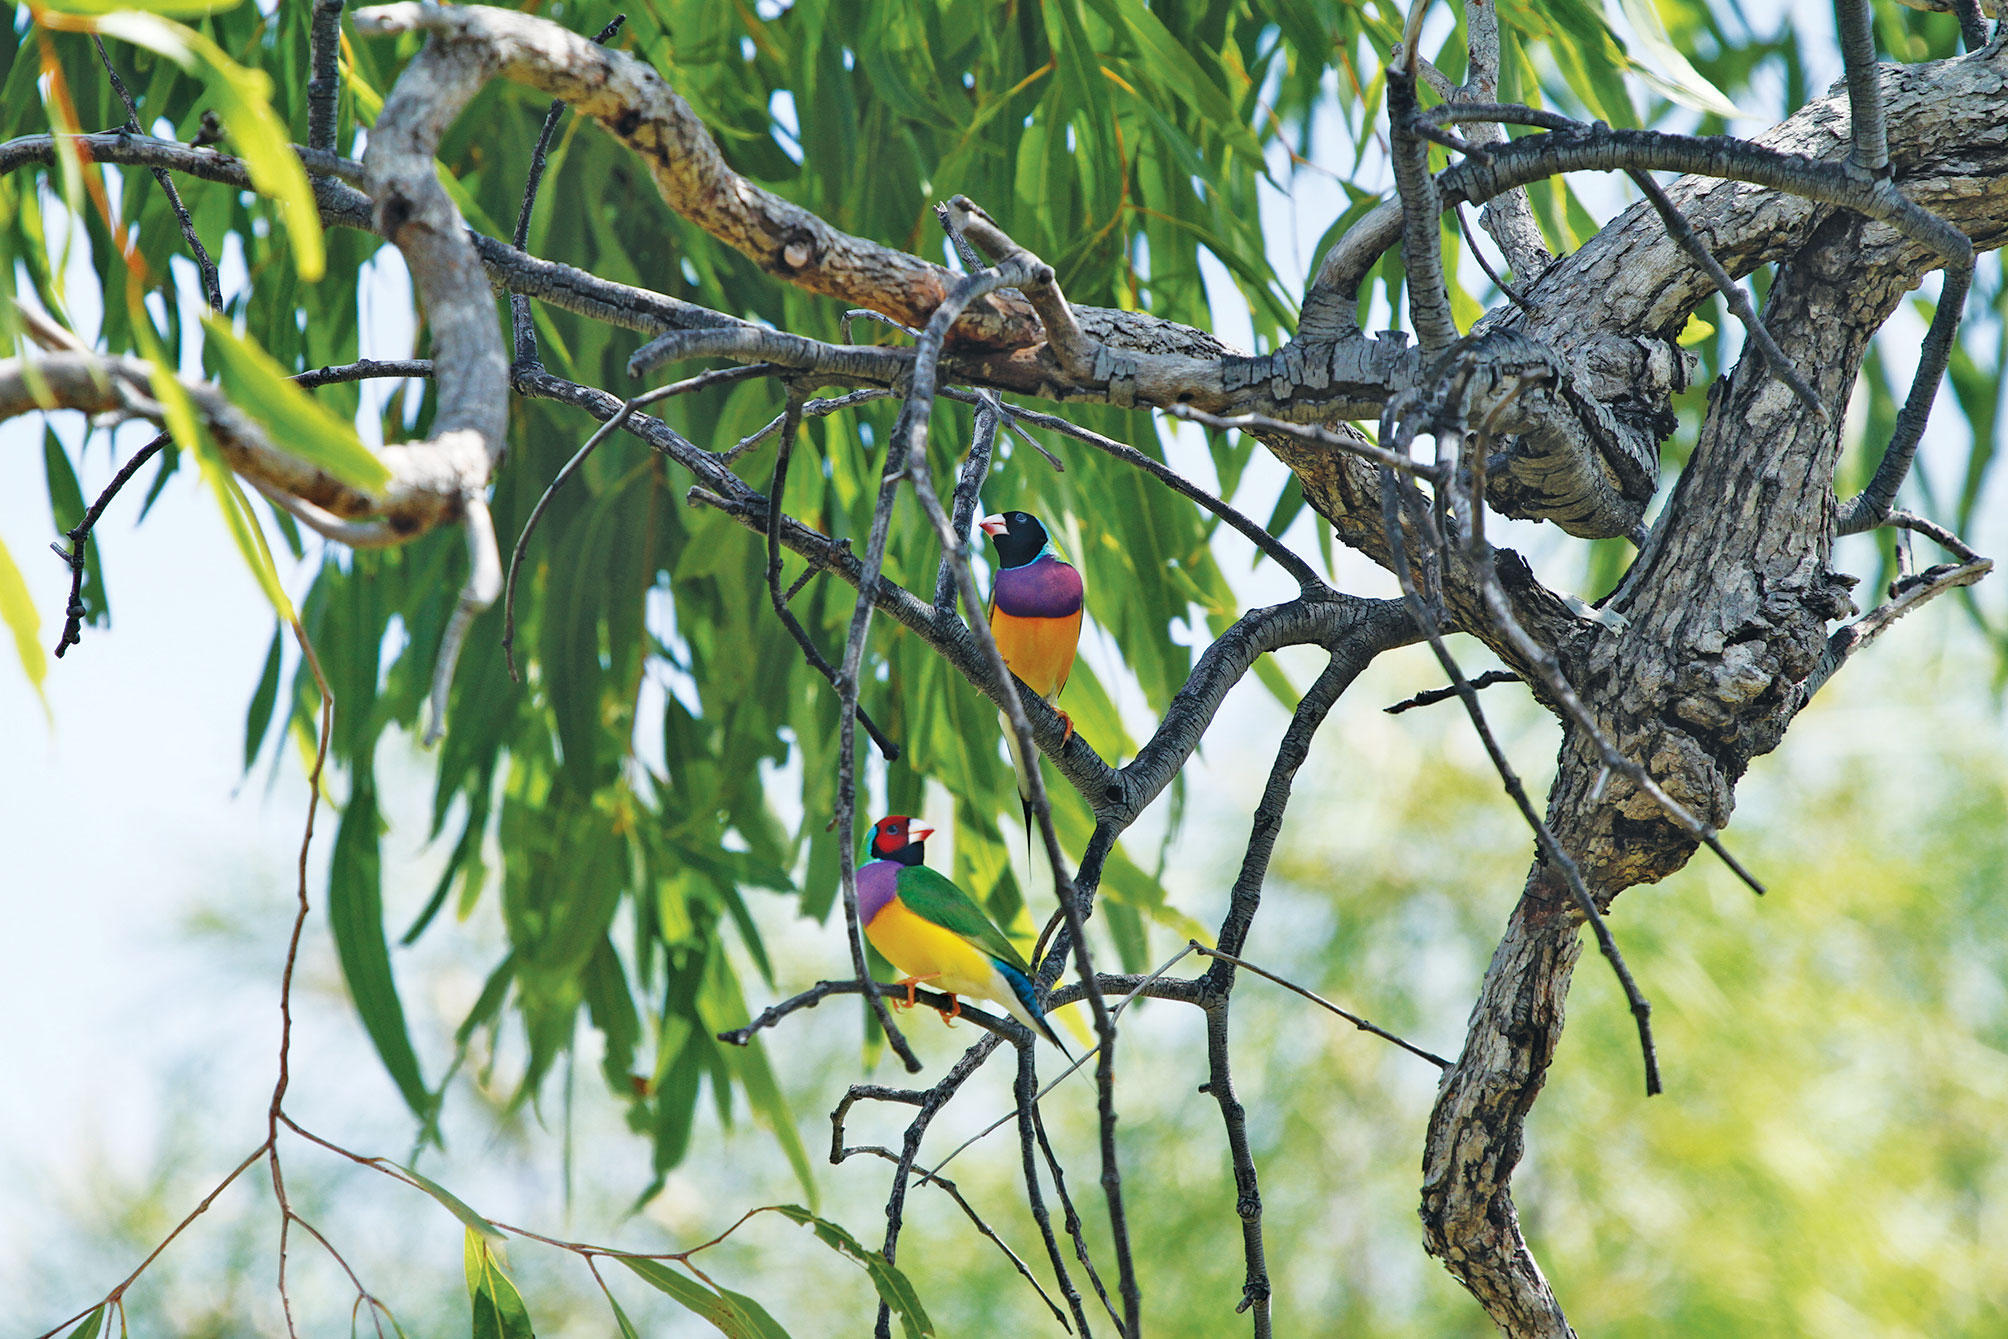 Two male Gouldian Finches spotted on the Dampier Peninsula of Australia's Kimberley region. Alexander Watson/WWF-Australia